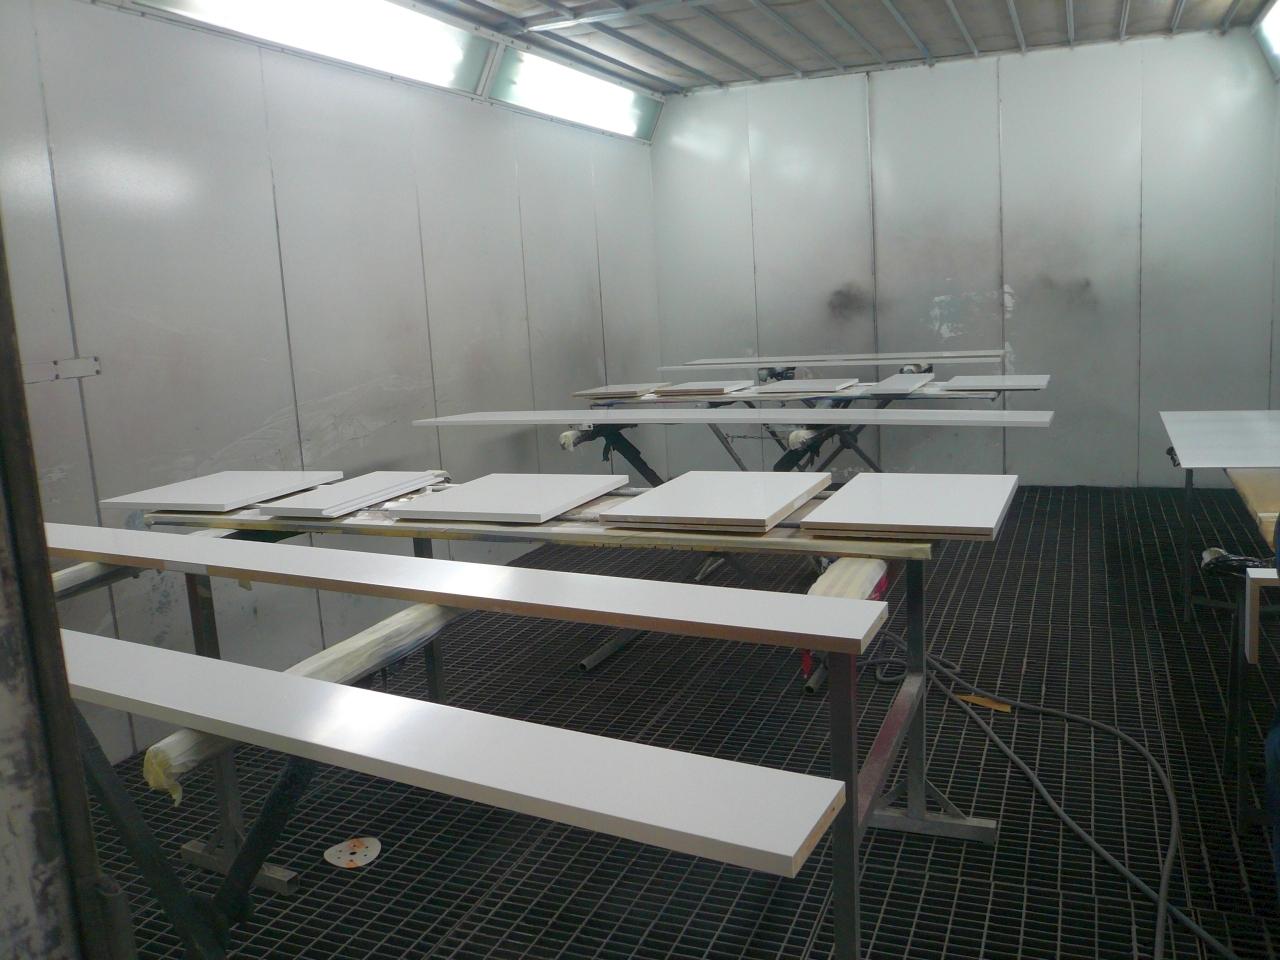 Industrielackierungen - Möbelfronten